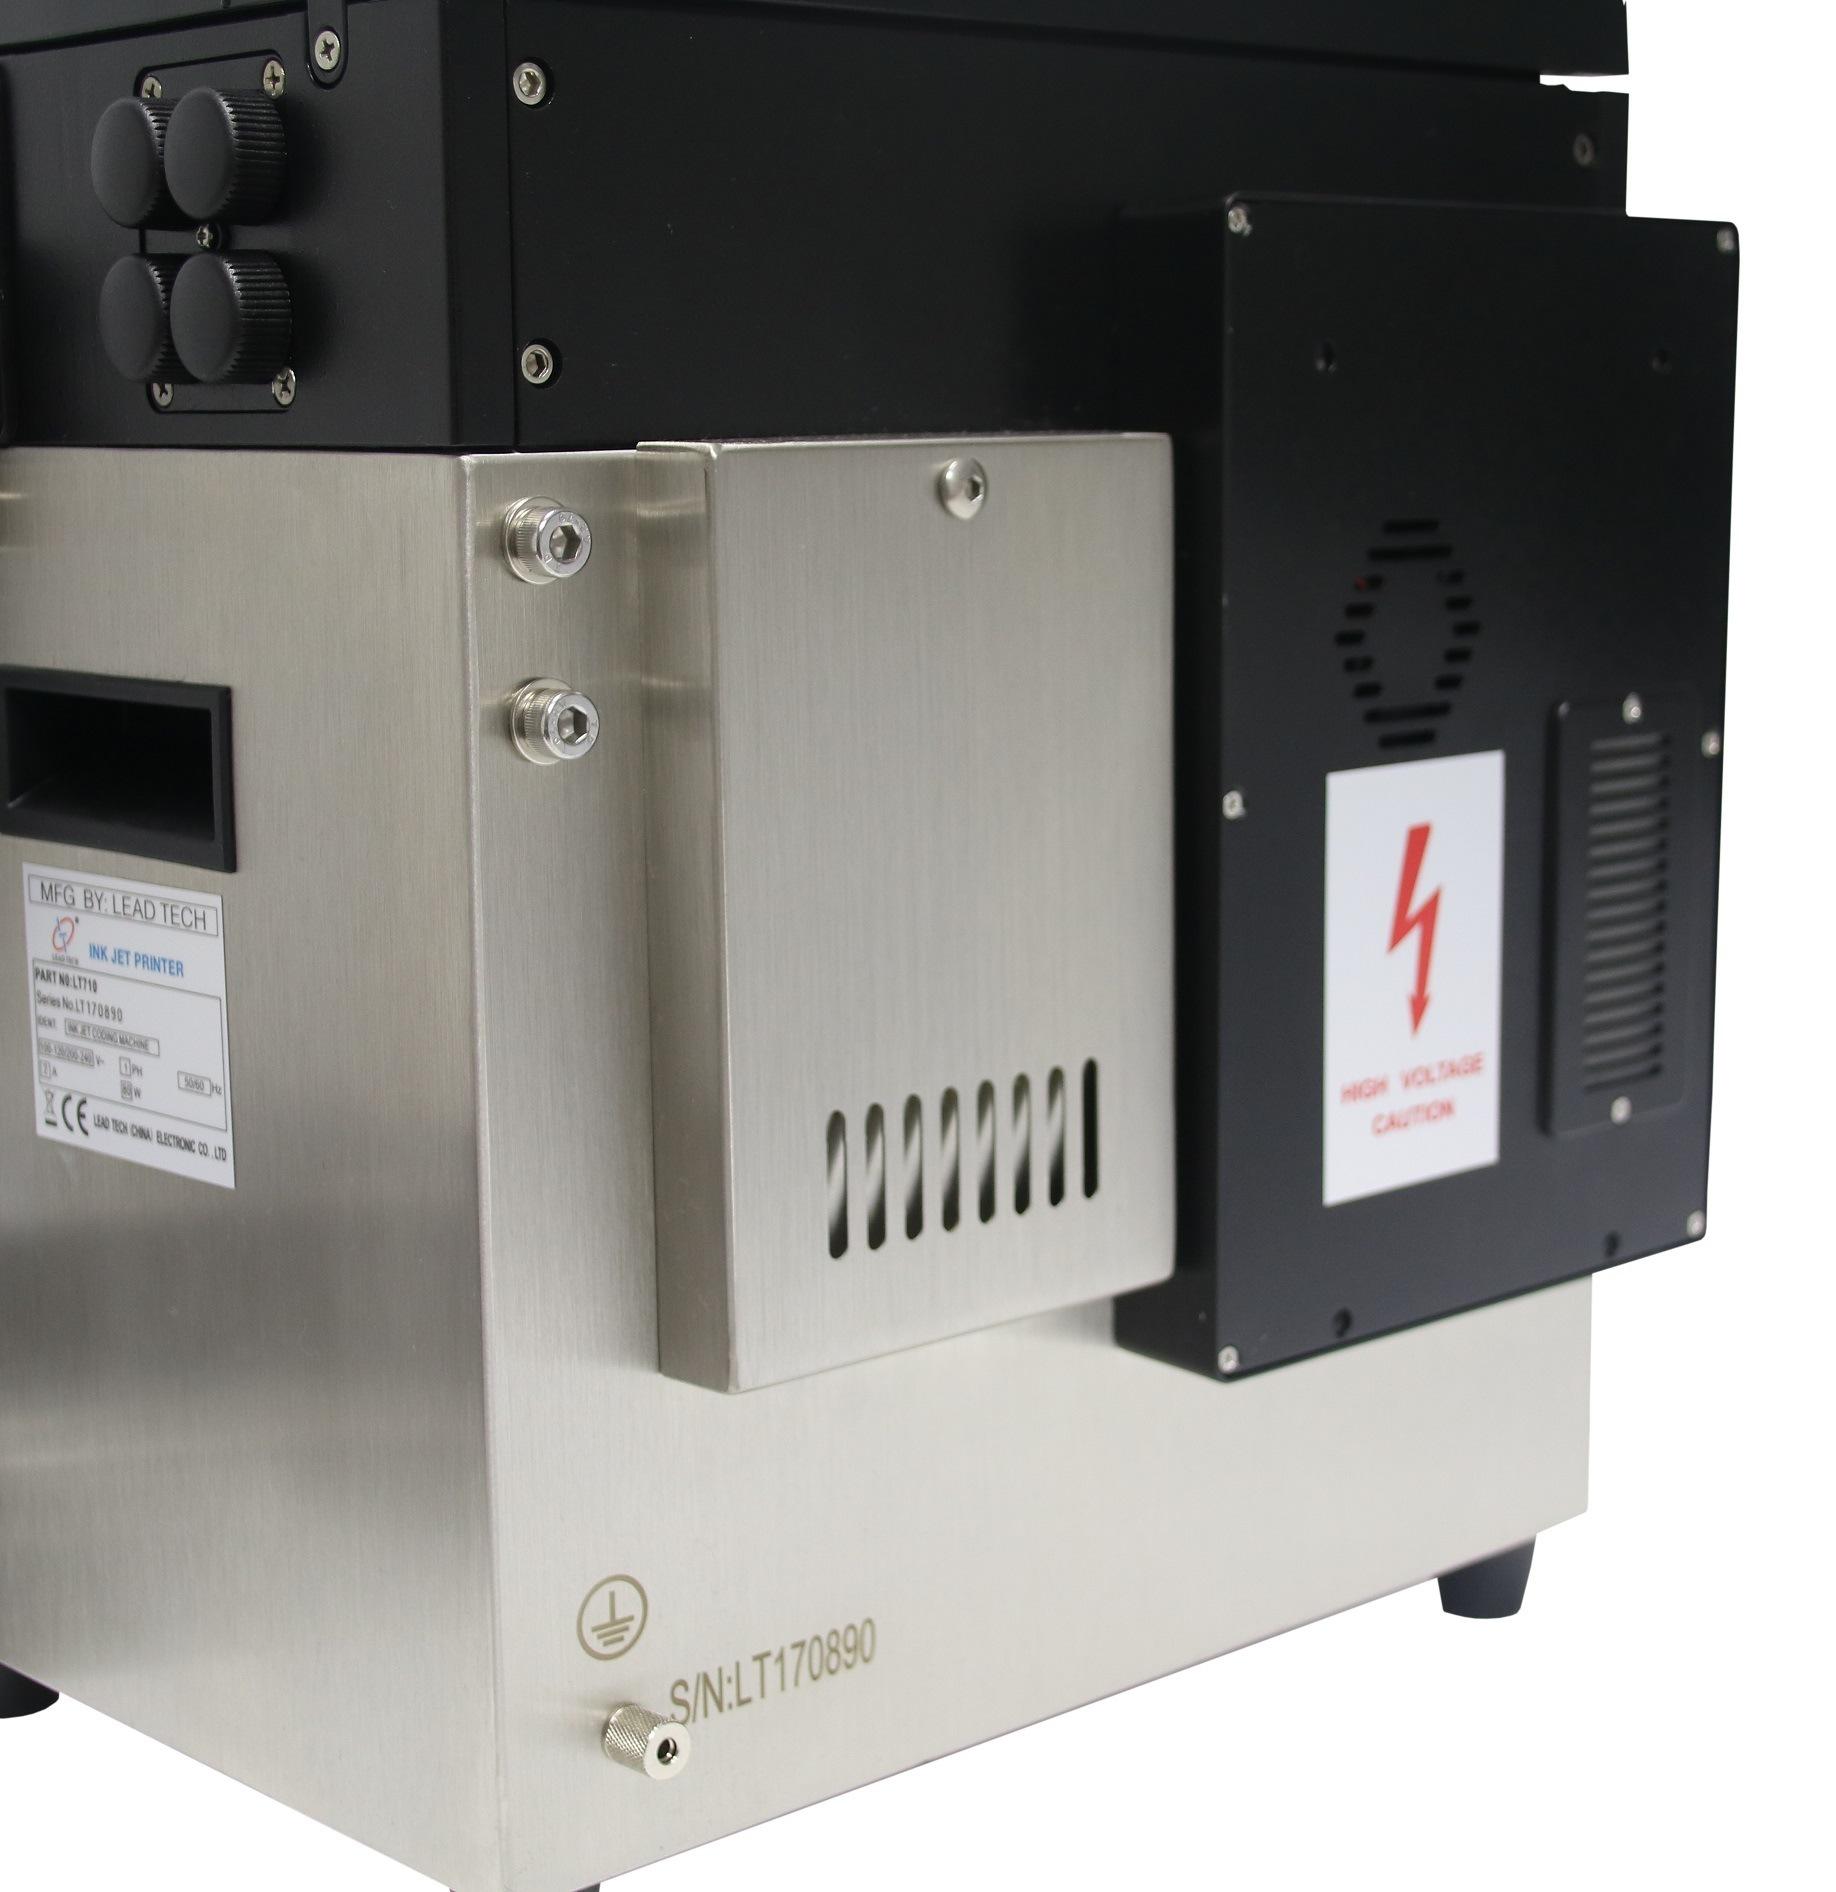 Lead Tech Lt760 Moving Head Printing Inkjet Printer